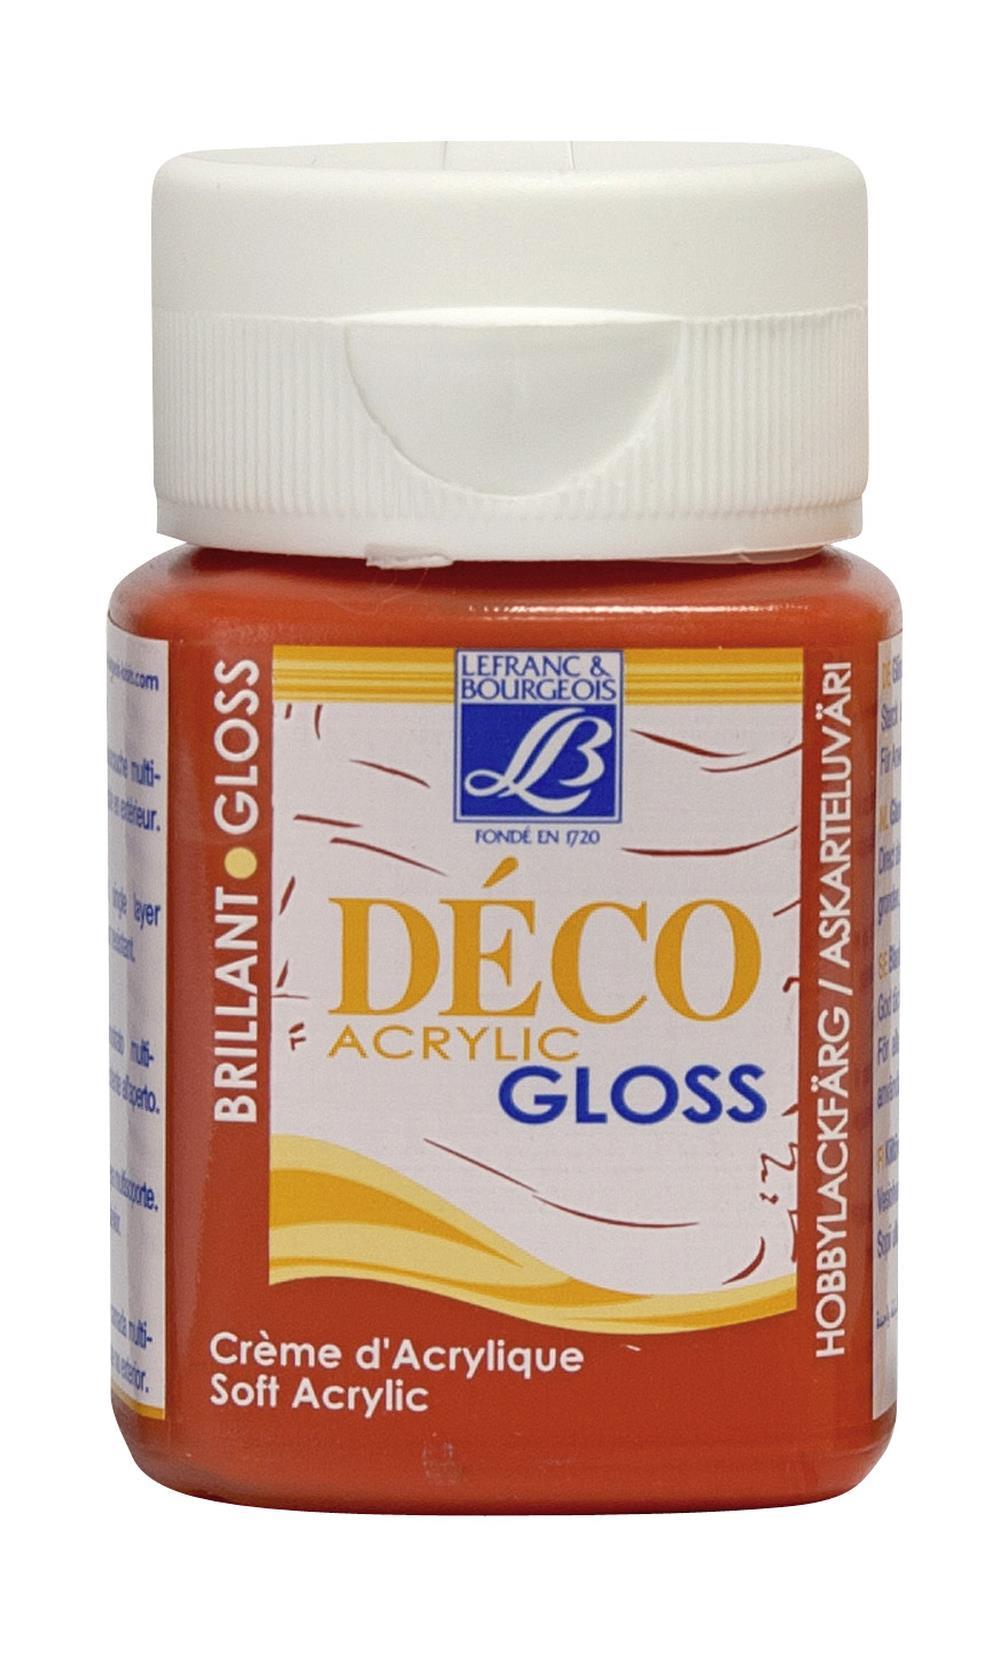 Hobbyfärg L&B Deco Gloss Akryl 50ml  Geranium 229 (4F) Utgår